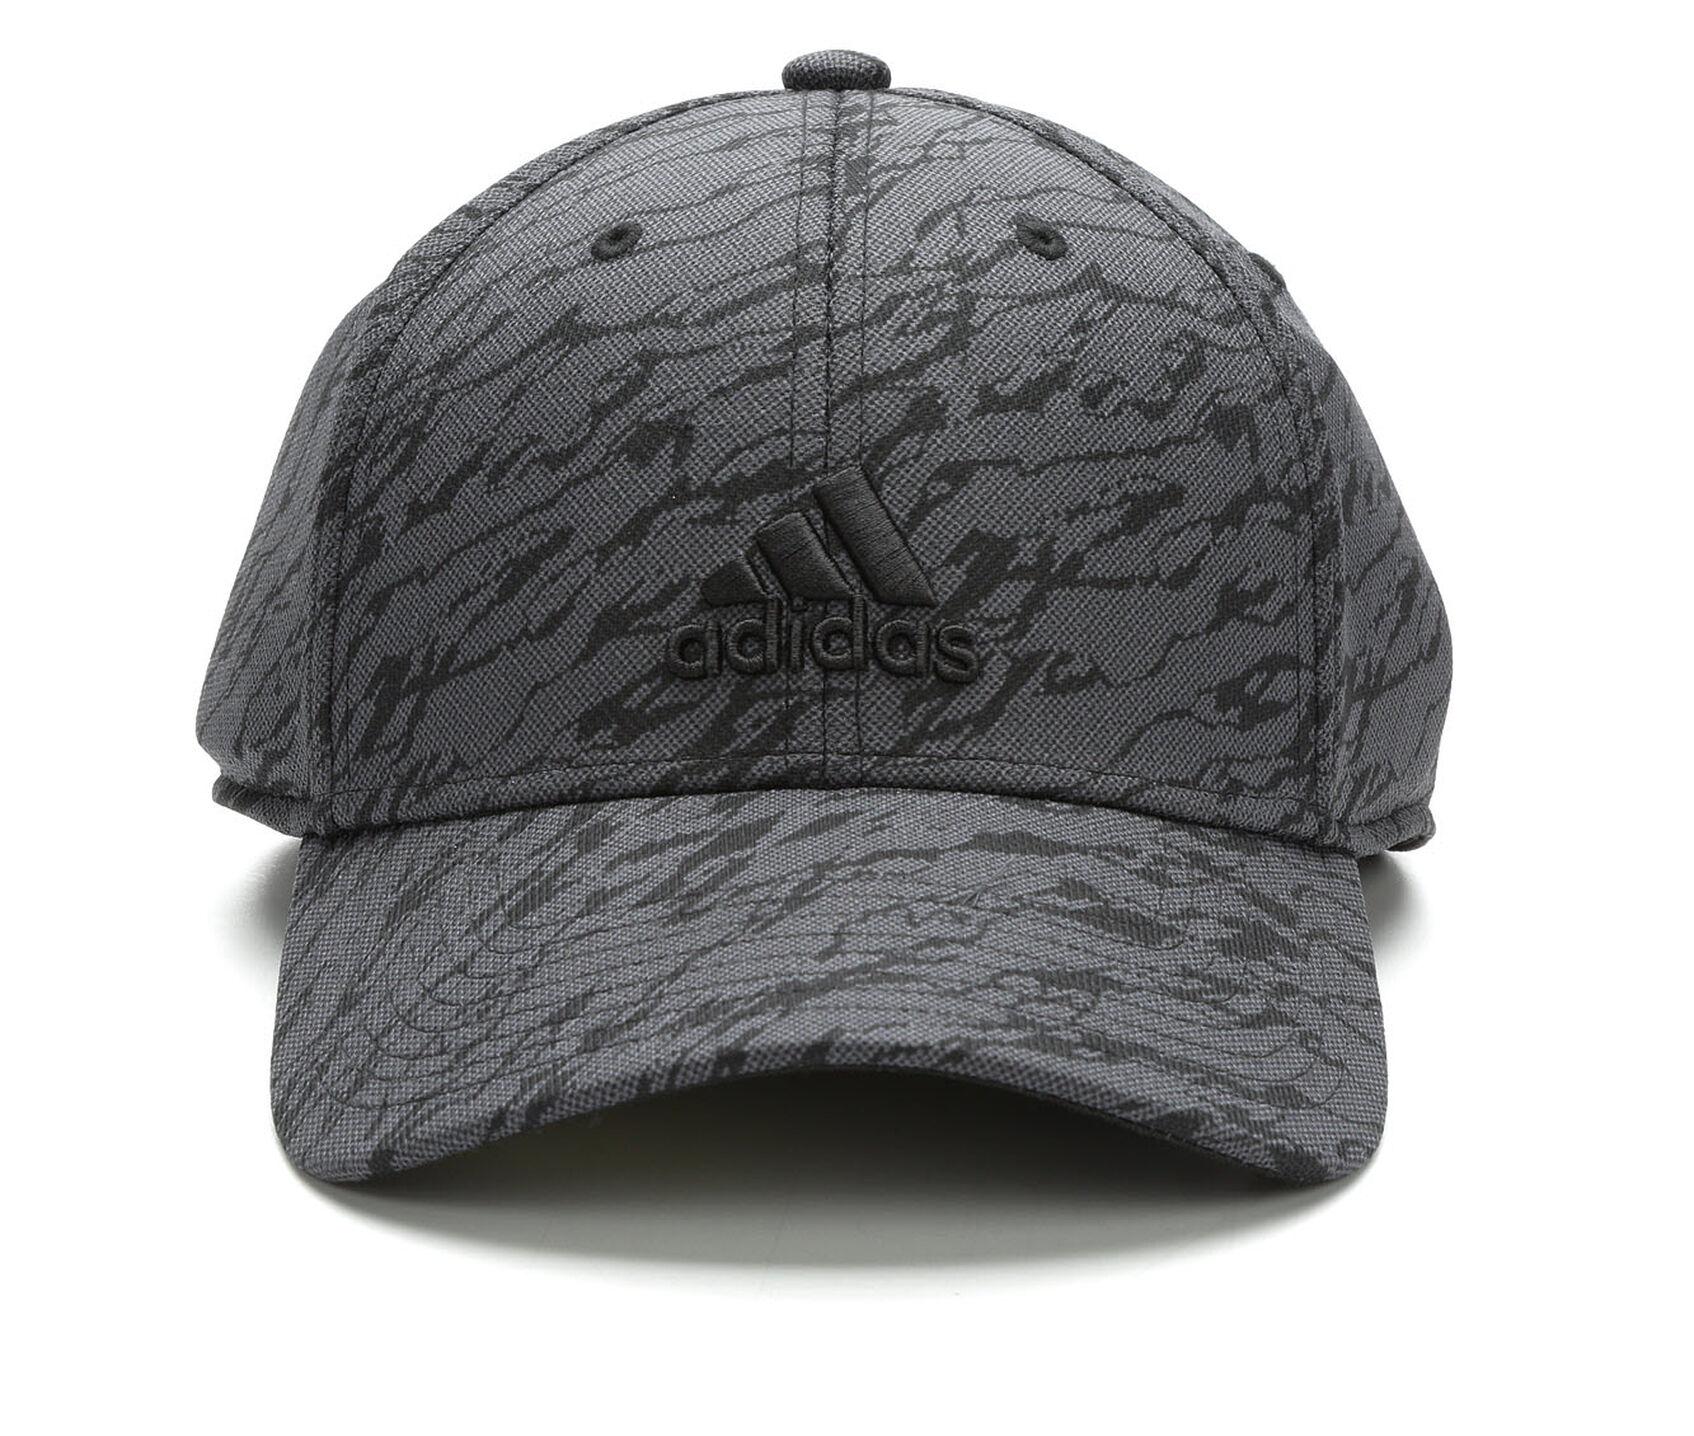 3e046359f4d Adidas Men s Rucker Plus Stretch Fit Baseball Cap